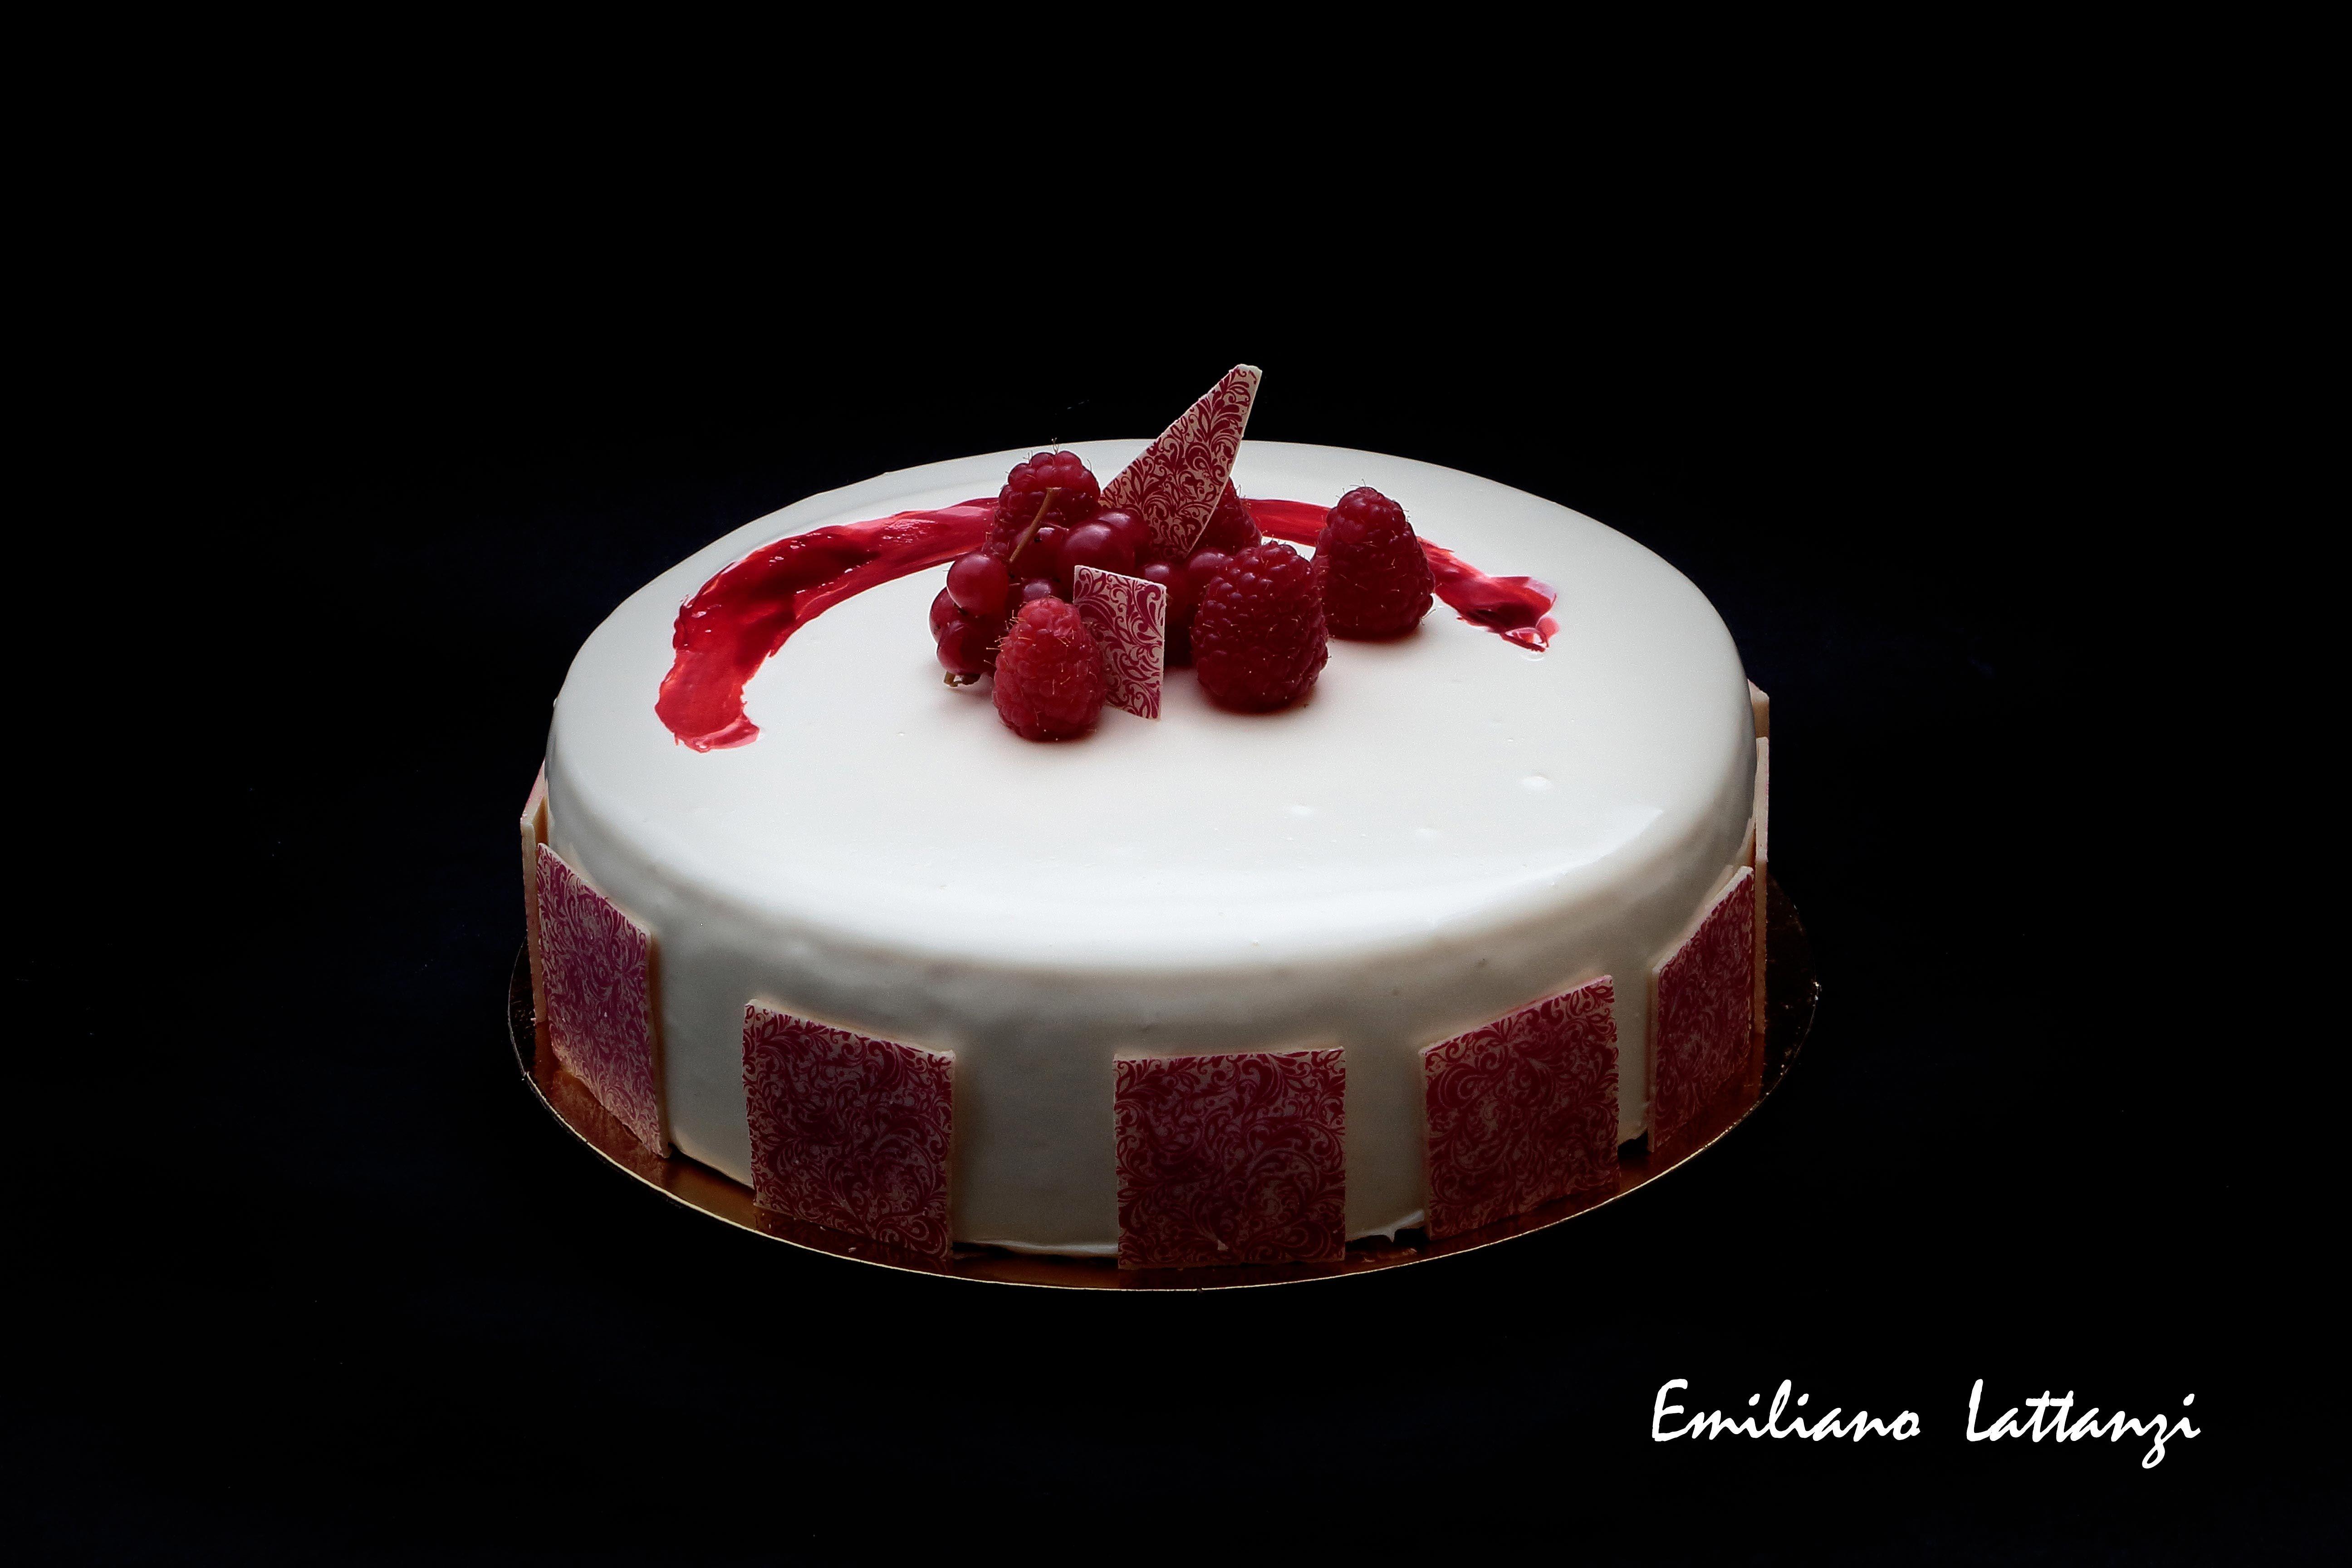 Torte Da Credenza Montersino : Perla rubino luca montersino bavarese al cioccolato bianco gelée